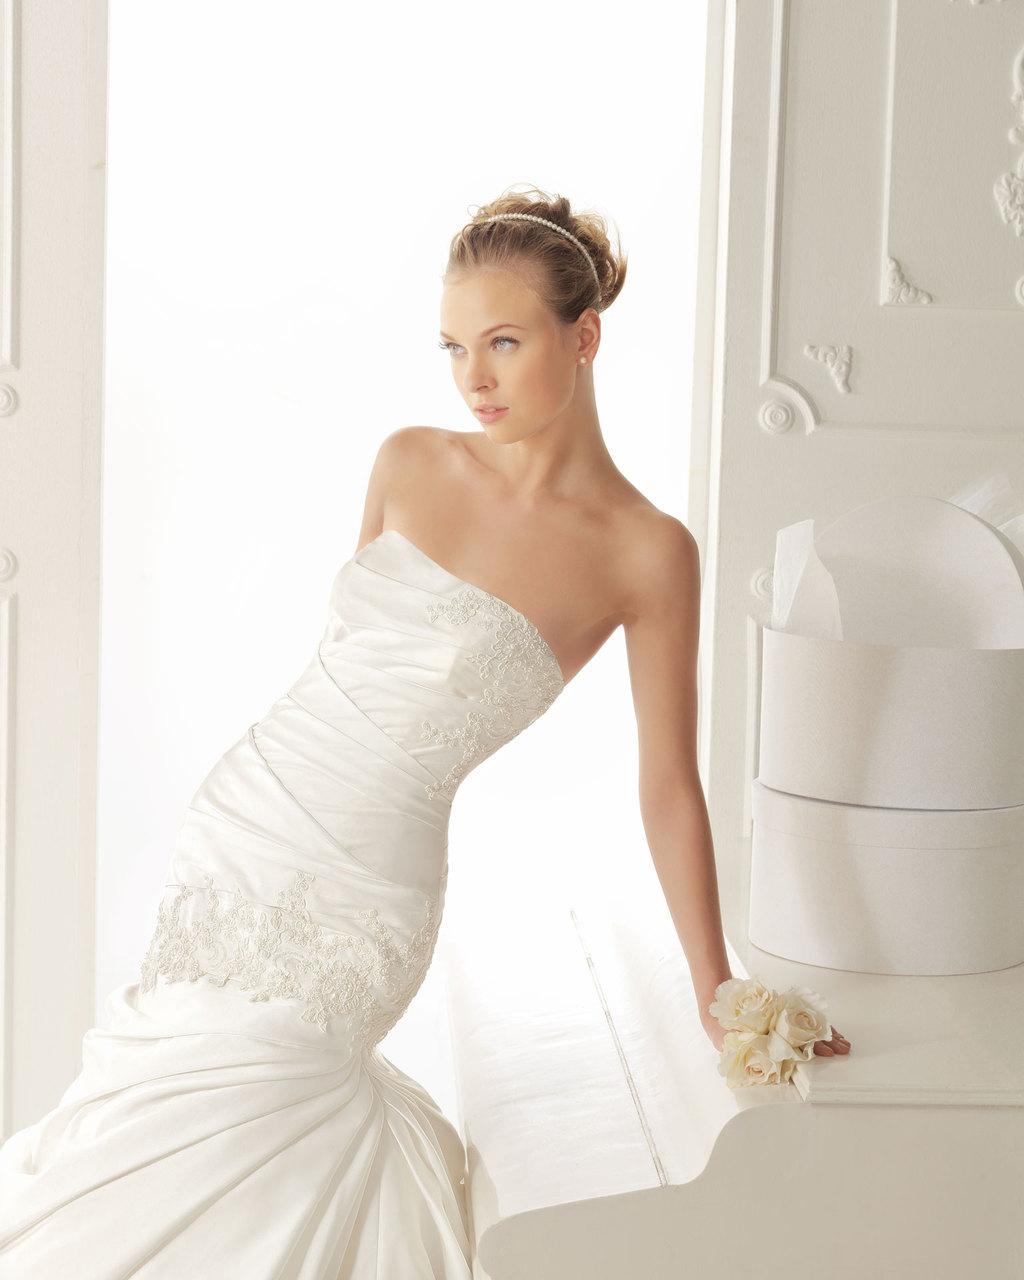 Aire-barcelona-wedding-dress-2013-vintage-bridal-collection-vali-2.full